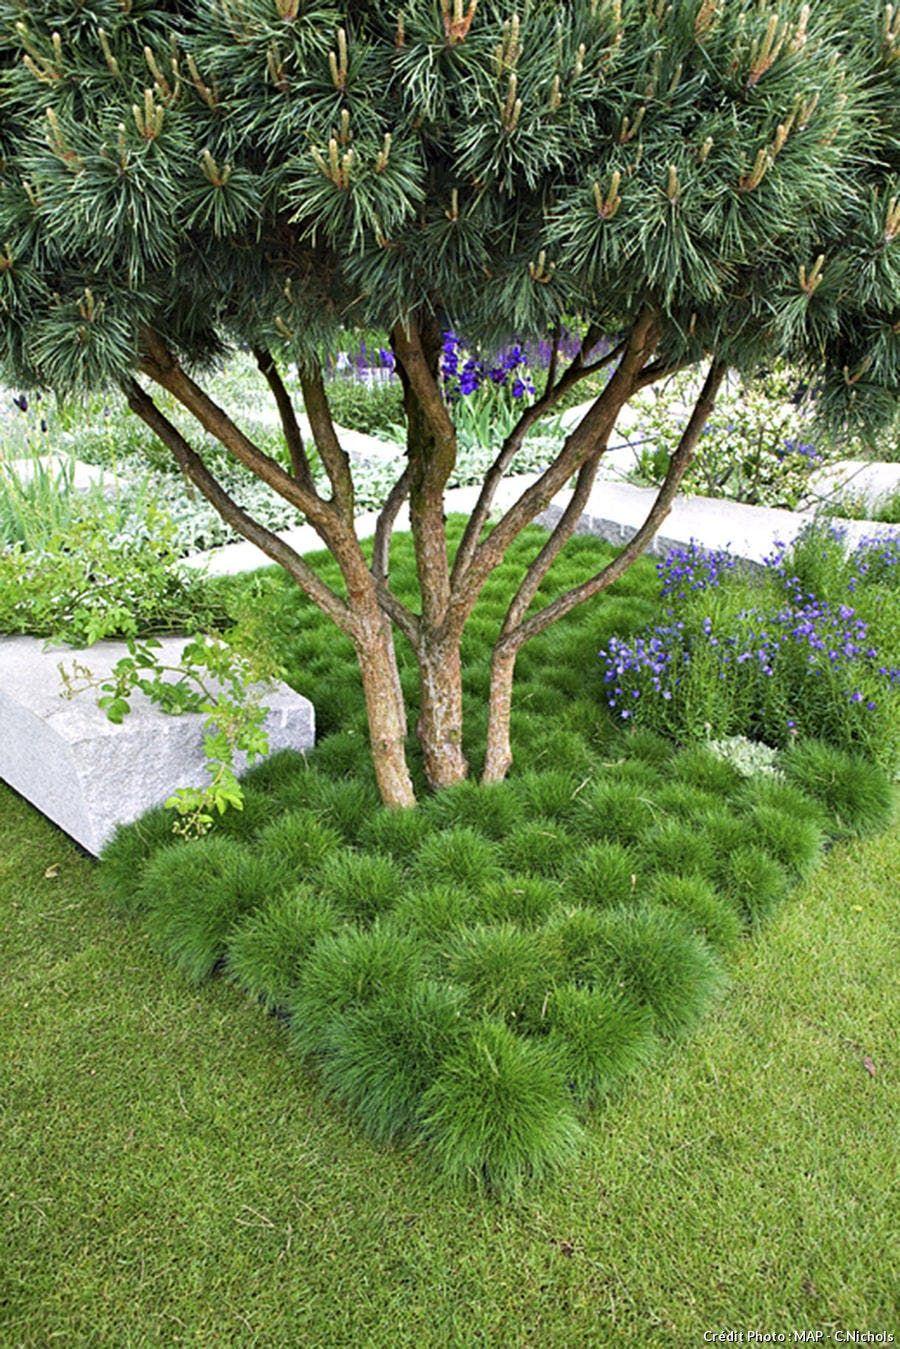 Les Plantes A Installer Sous Les Arbres Decor De Jardin Diy